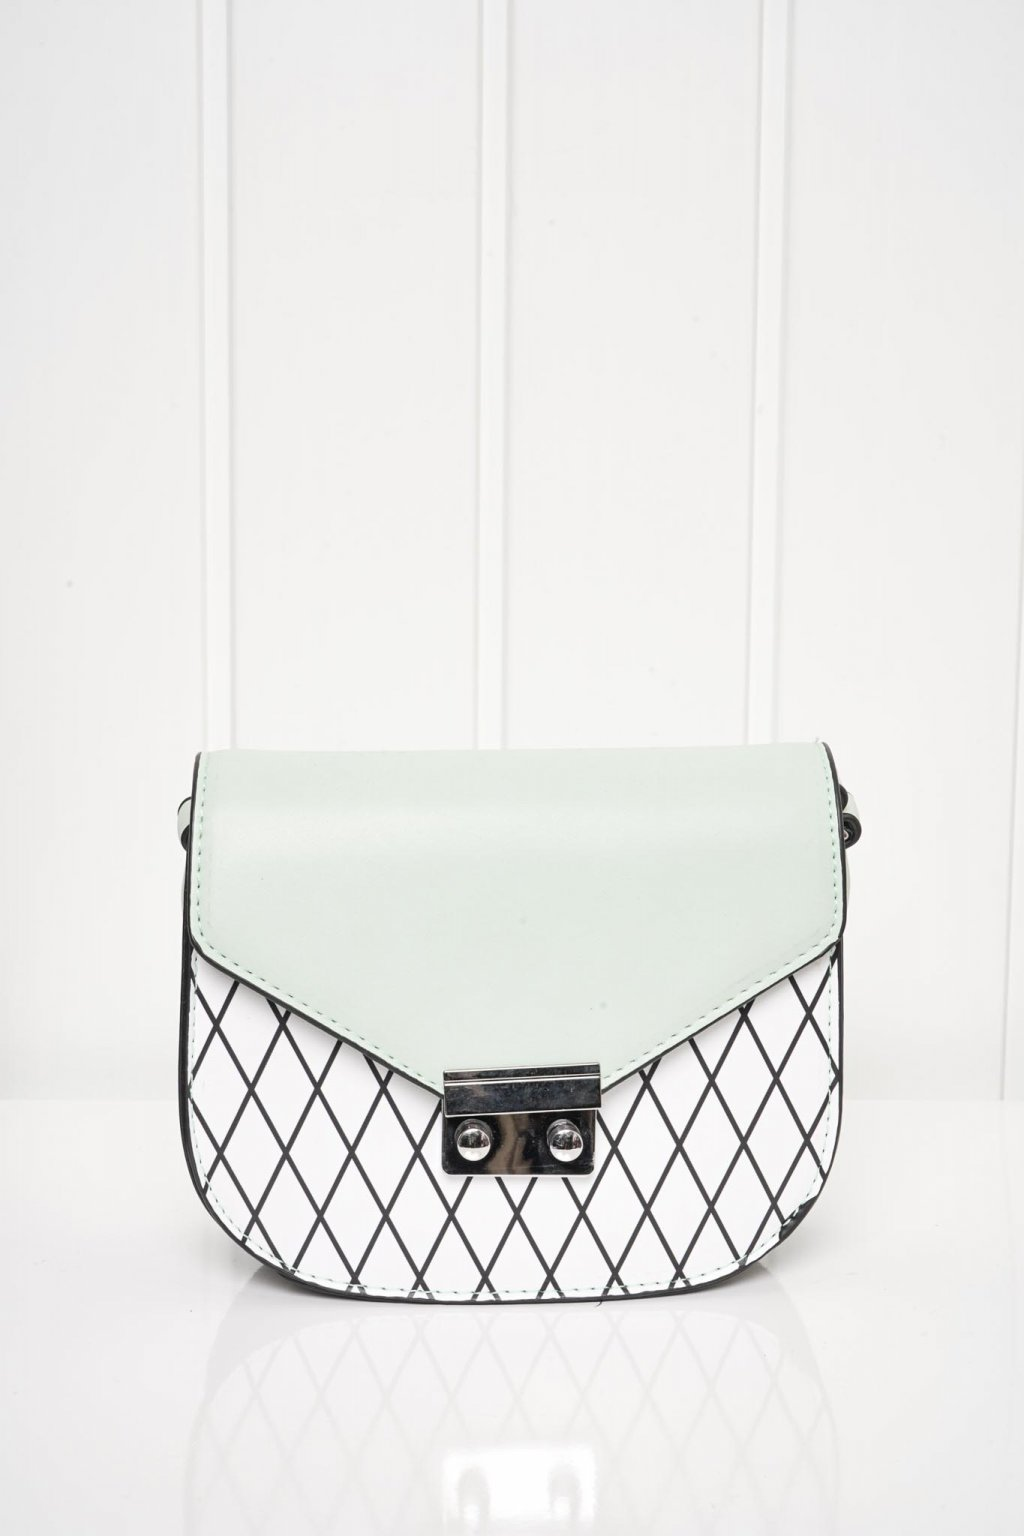 Kabelka, crossbody, ruksak, shopping bag, shopperka, 243